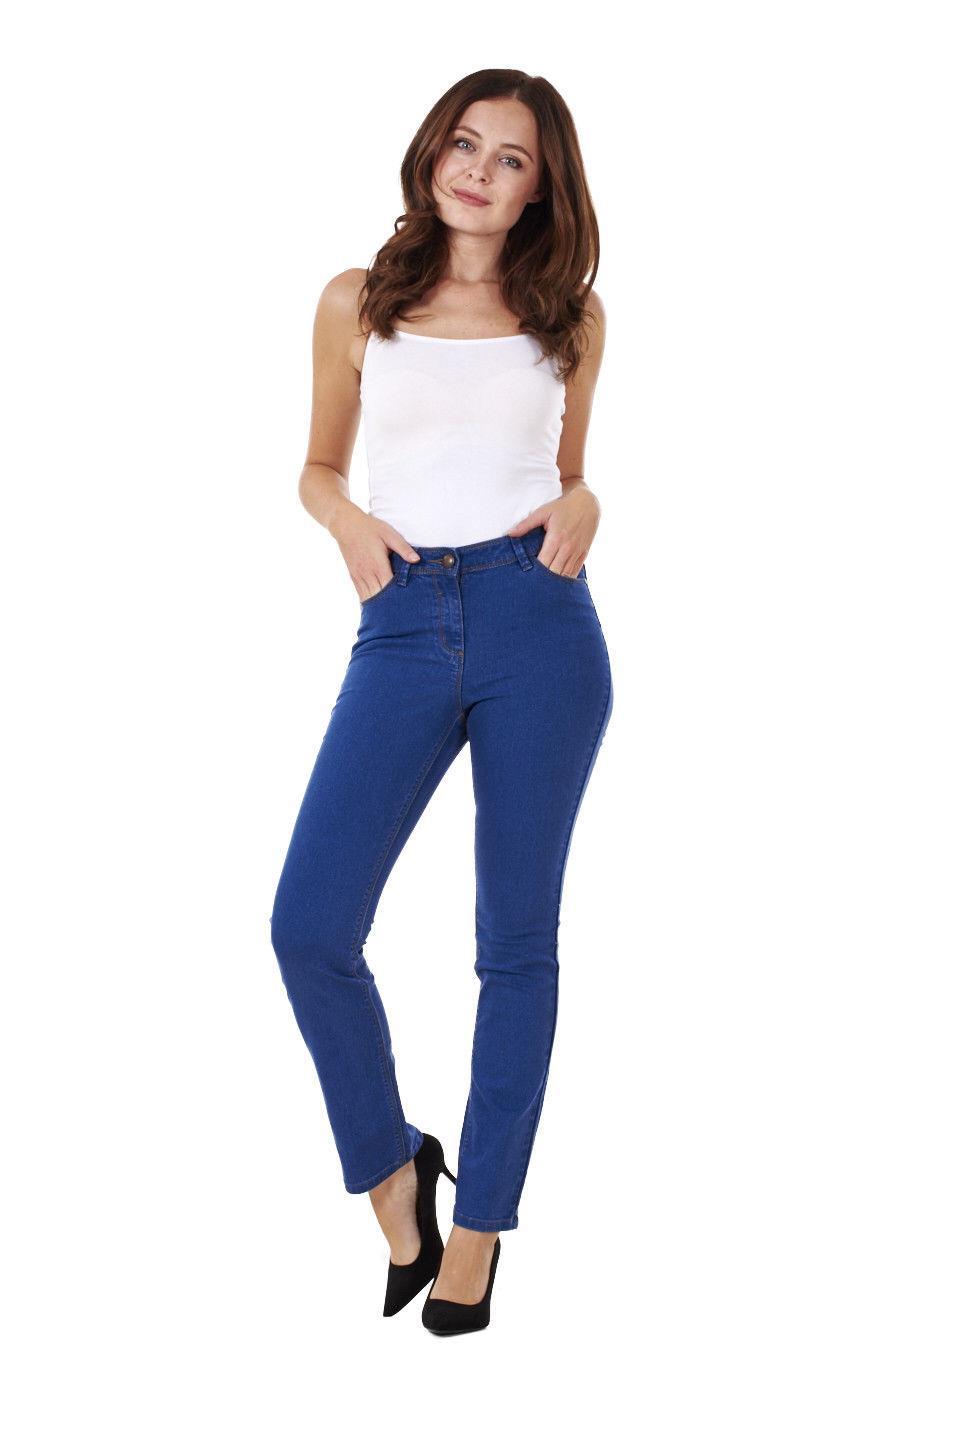 Ladies-Straight-Leg-Denim-Womens-Pants-Stretch-Regular-Fit-Jeans thumbnail 13